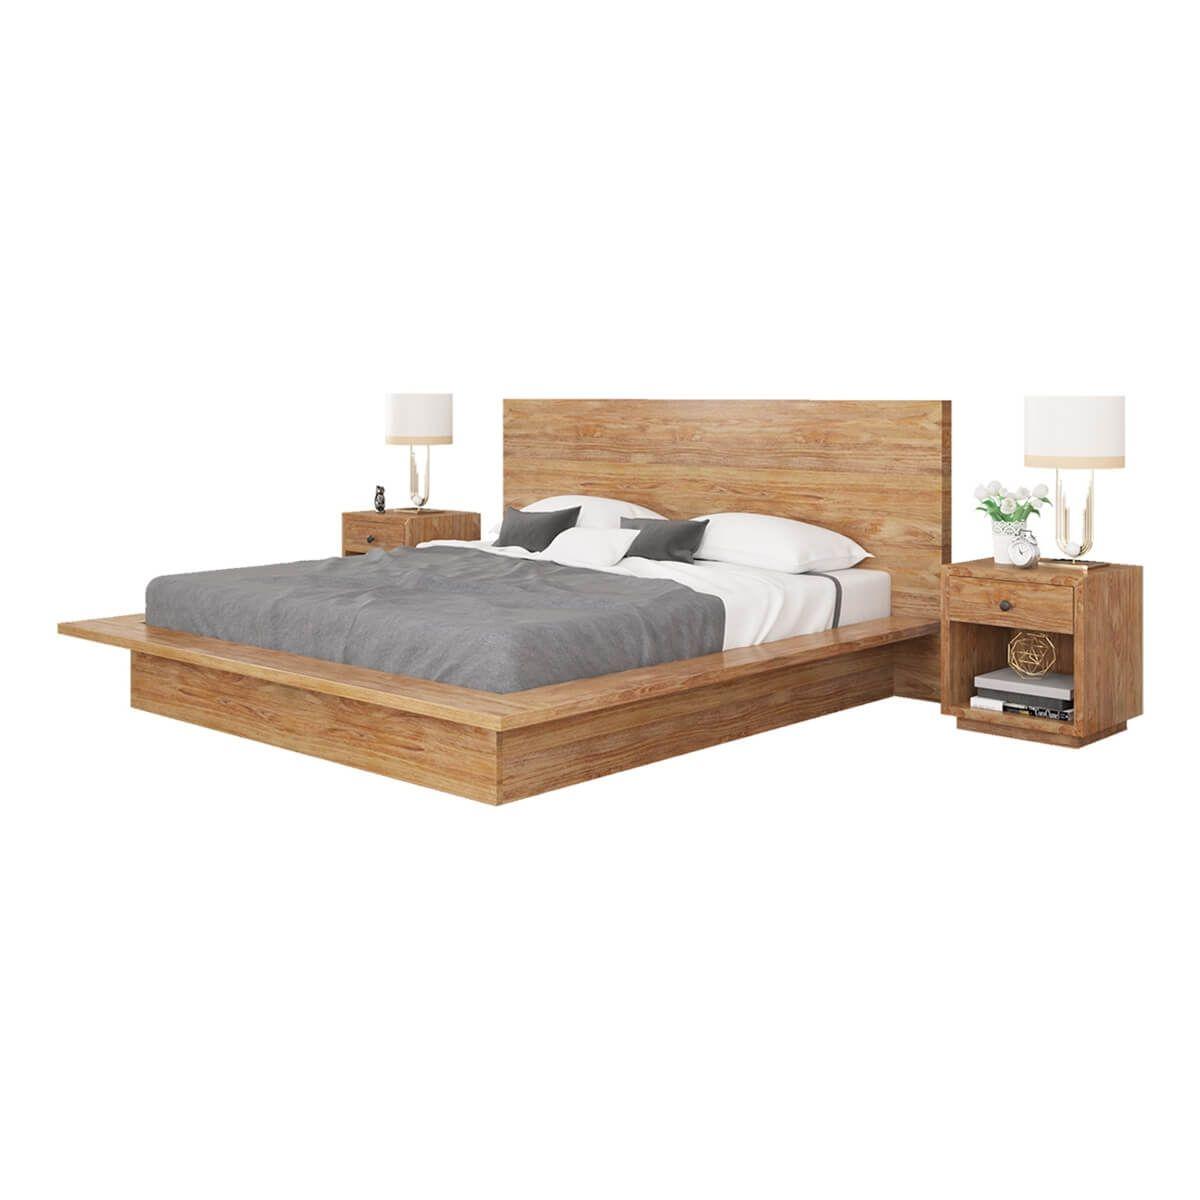 Britain Rustic Teak Wood Full Size Platform Bed Frame In 2020